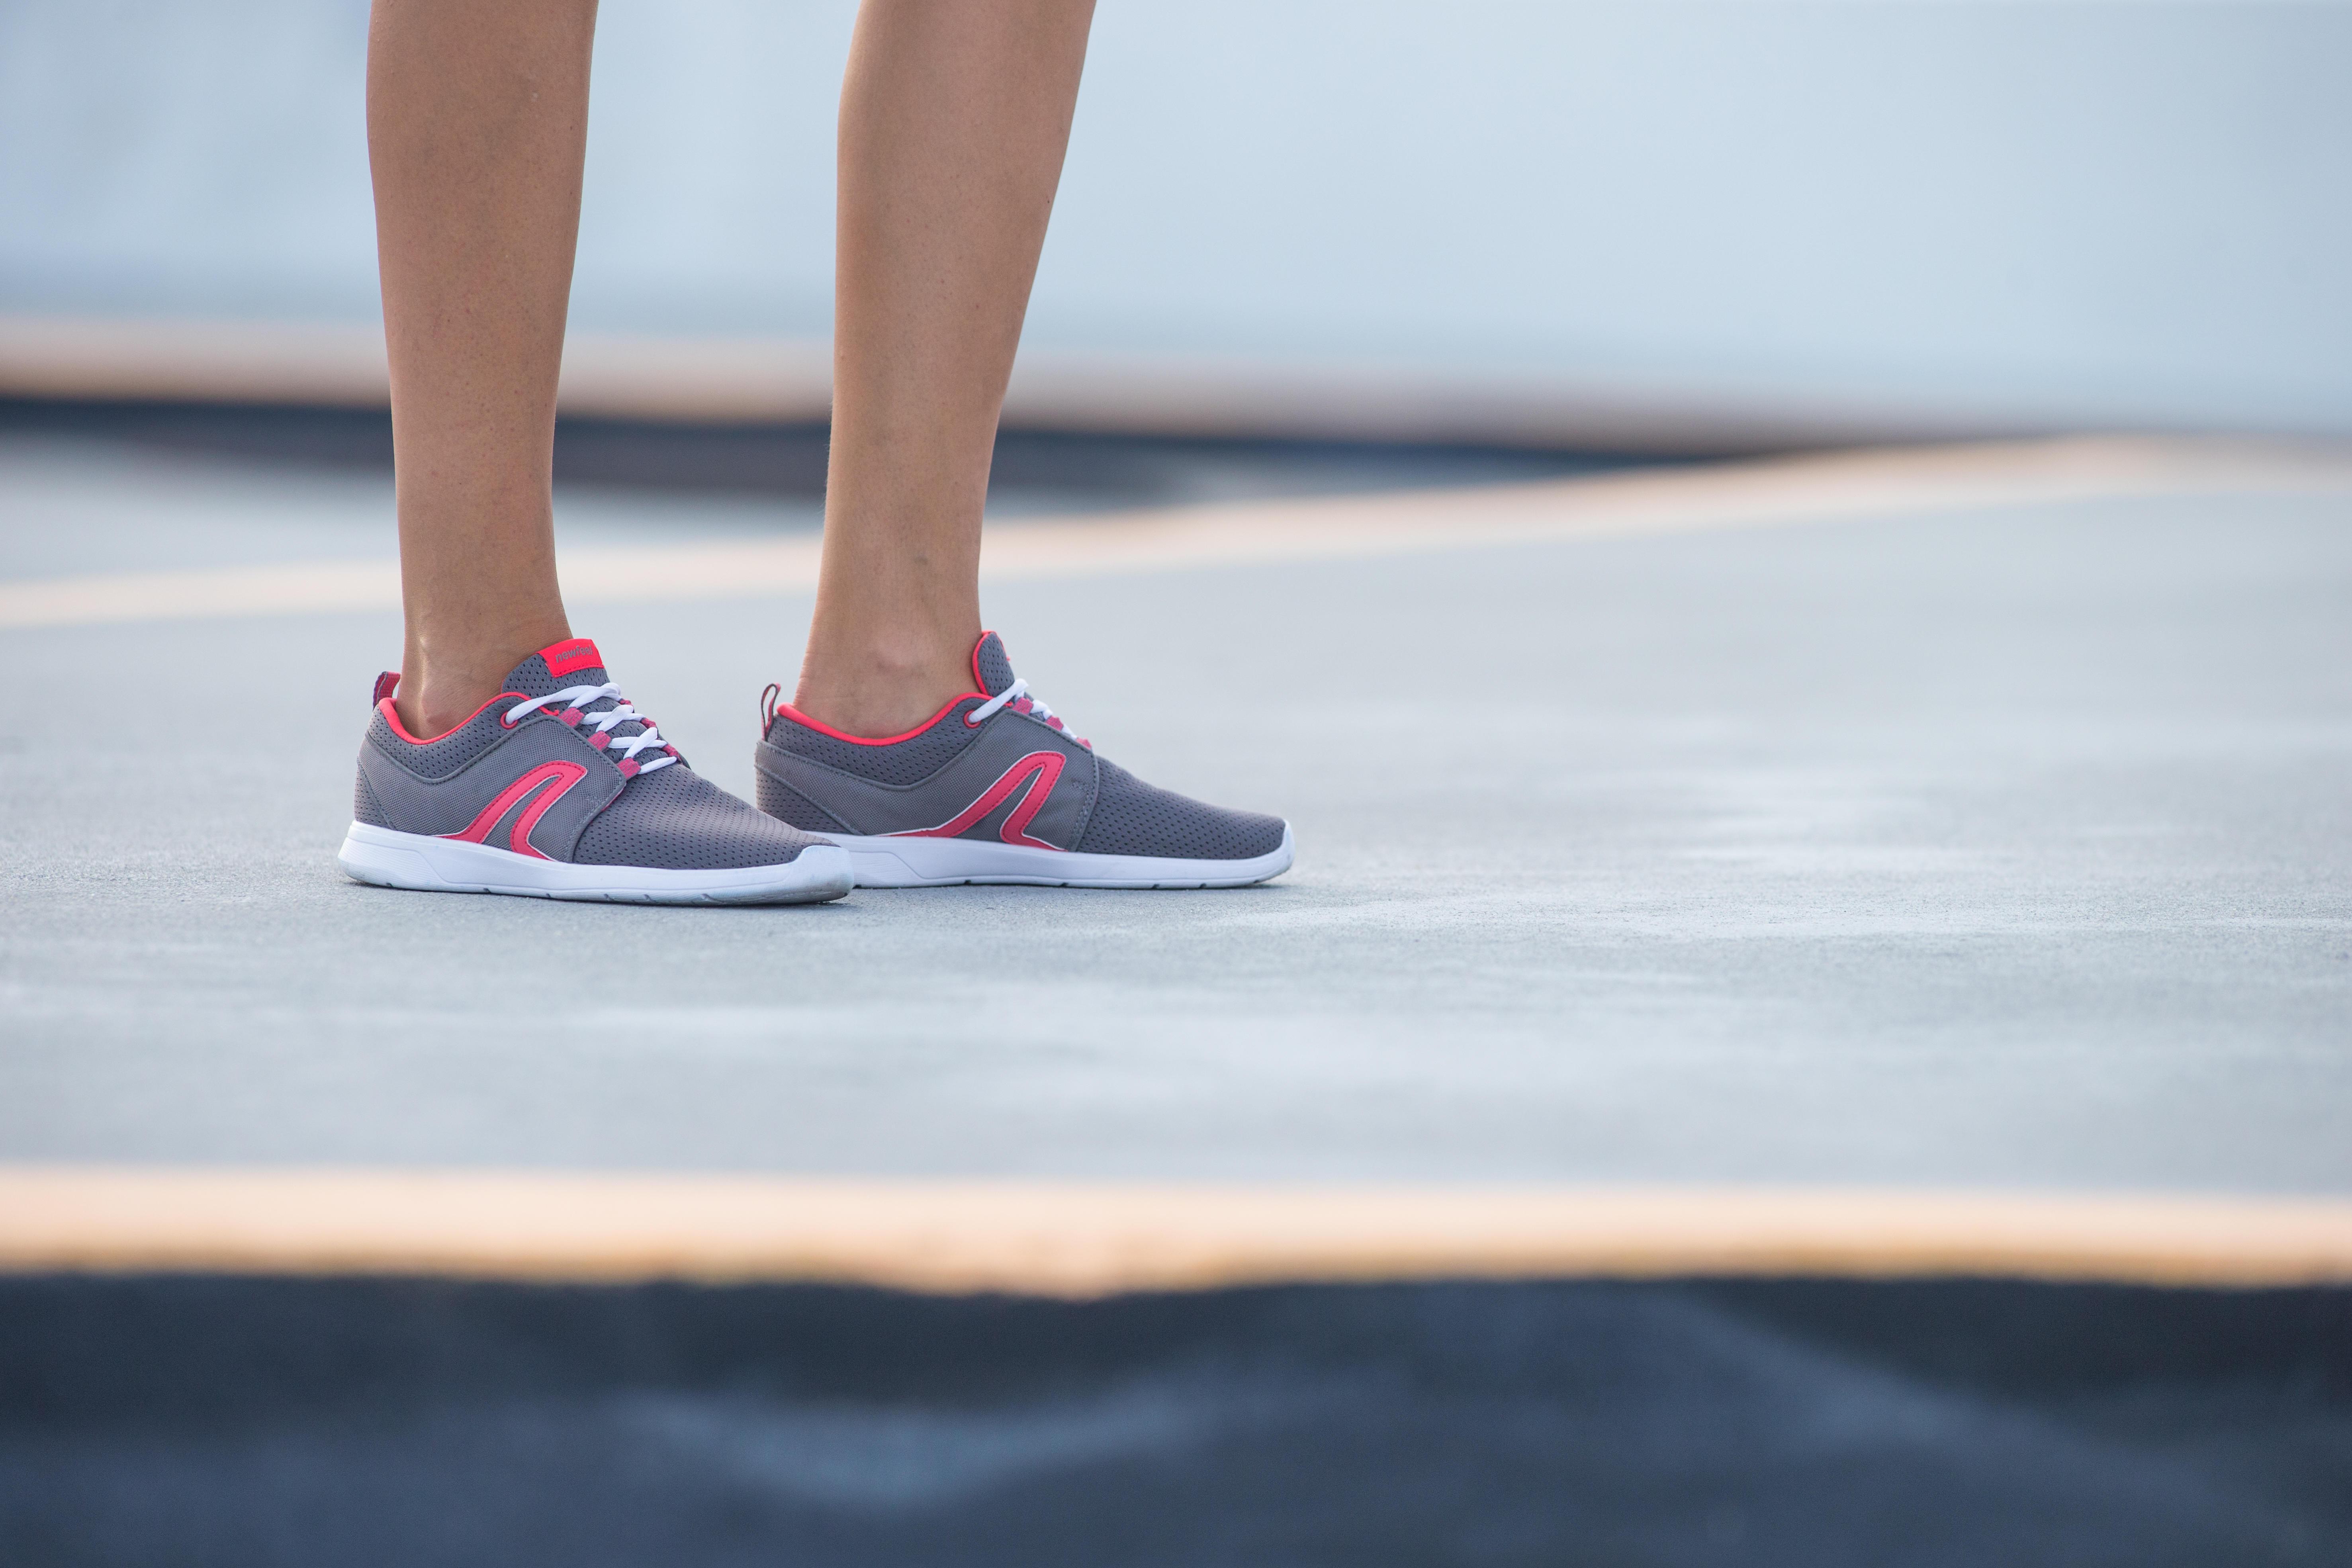 Walking shoes for women soft 140 mesh - Grey/Pink